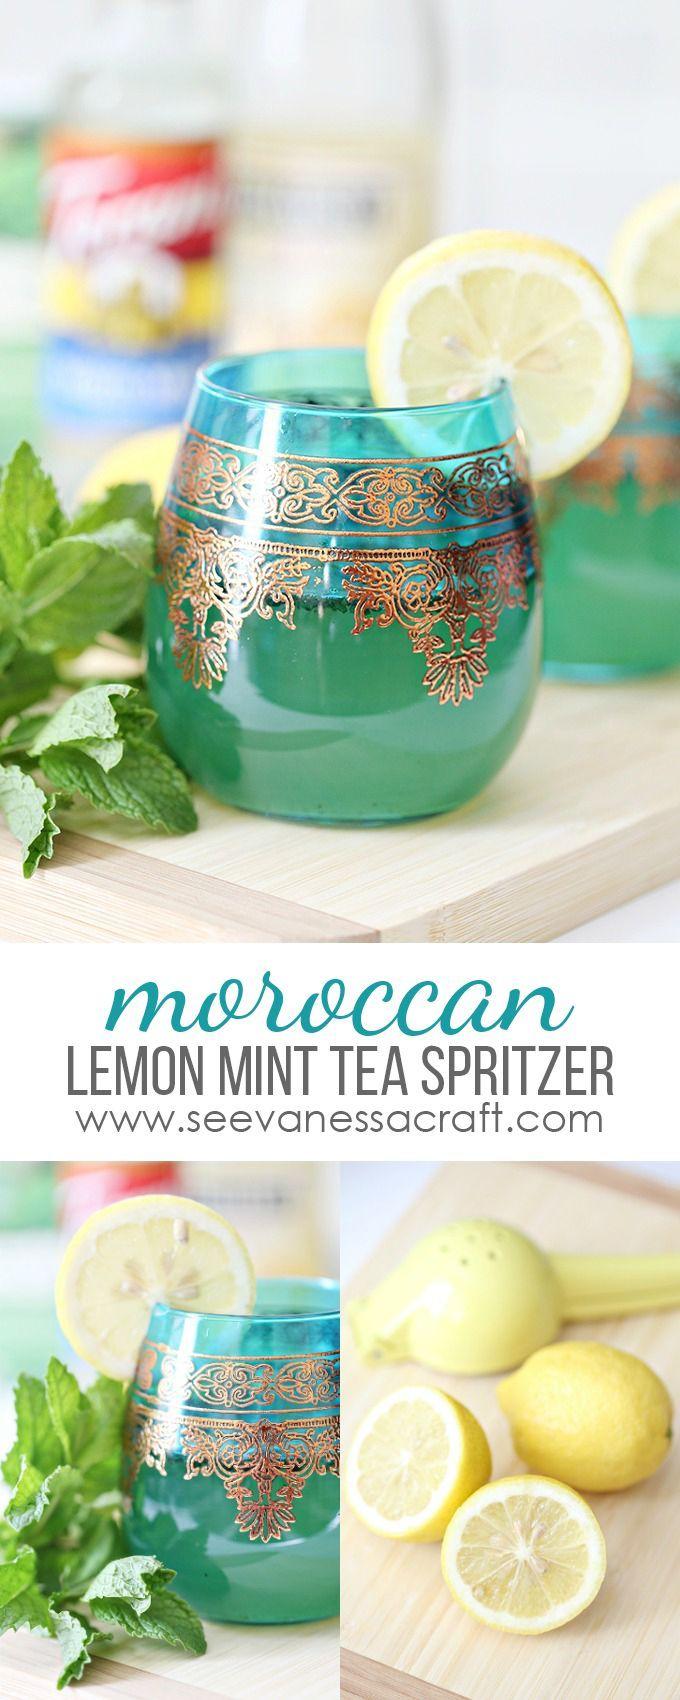 Moroccan Lemon Mint Tea Spritzer Drink Recipe @worldmarket #worldmarkettribe #FallHomeRefresh #ad